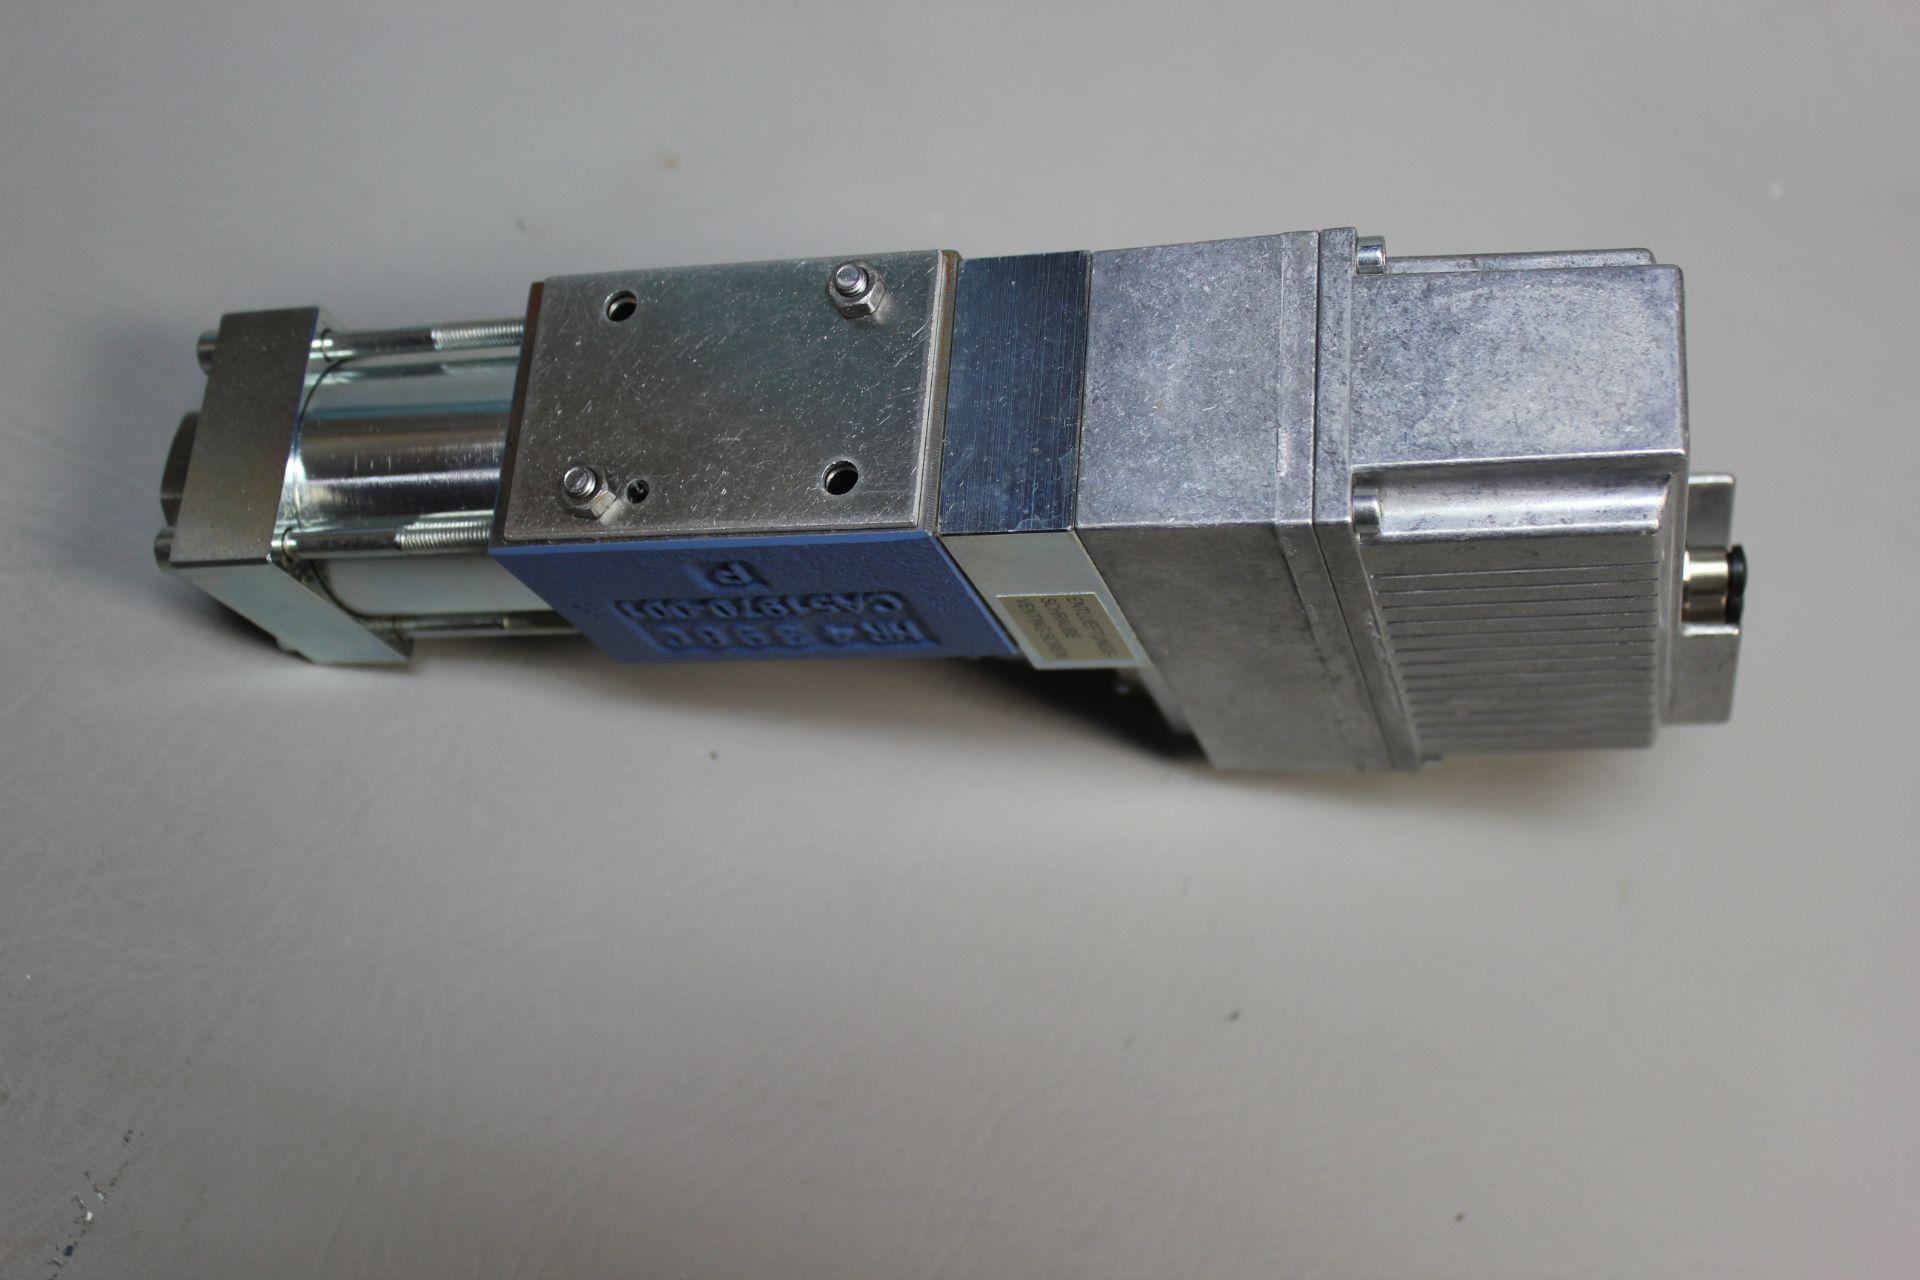 NEW MOOG DIRECT DRIVE DIGITAL CONTROL HYDRAULIC SERVO VALVE - Image 12 of 12